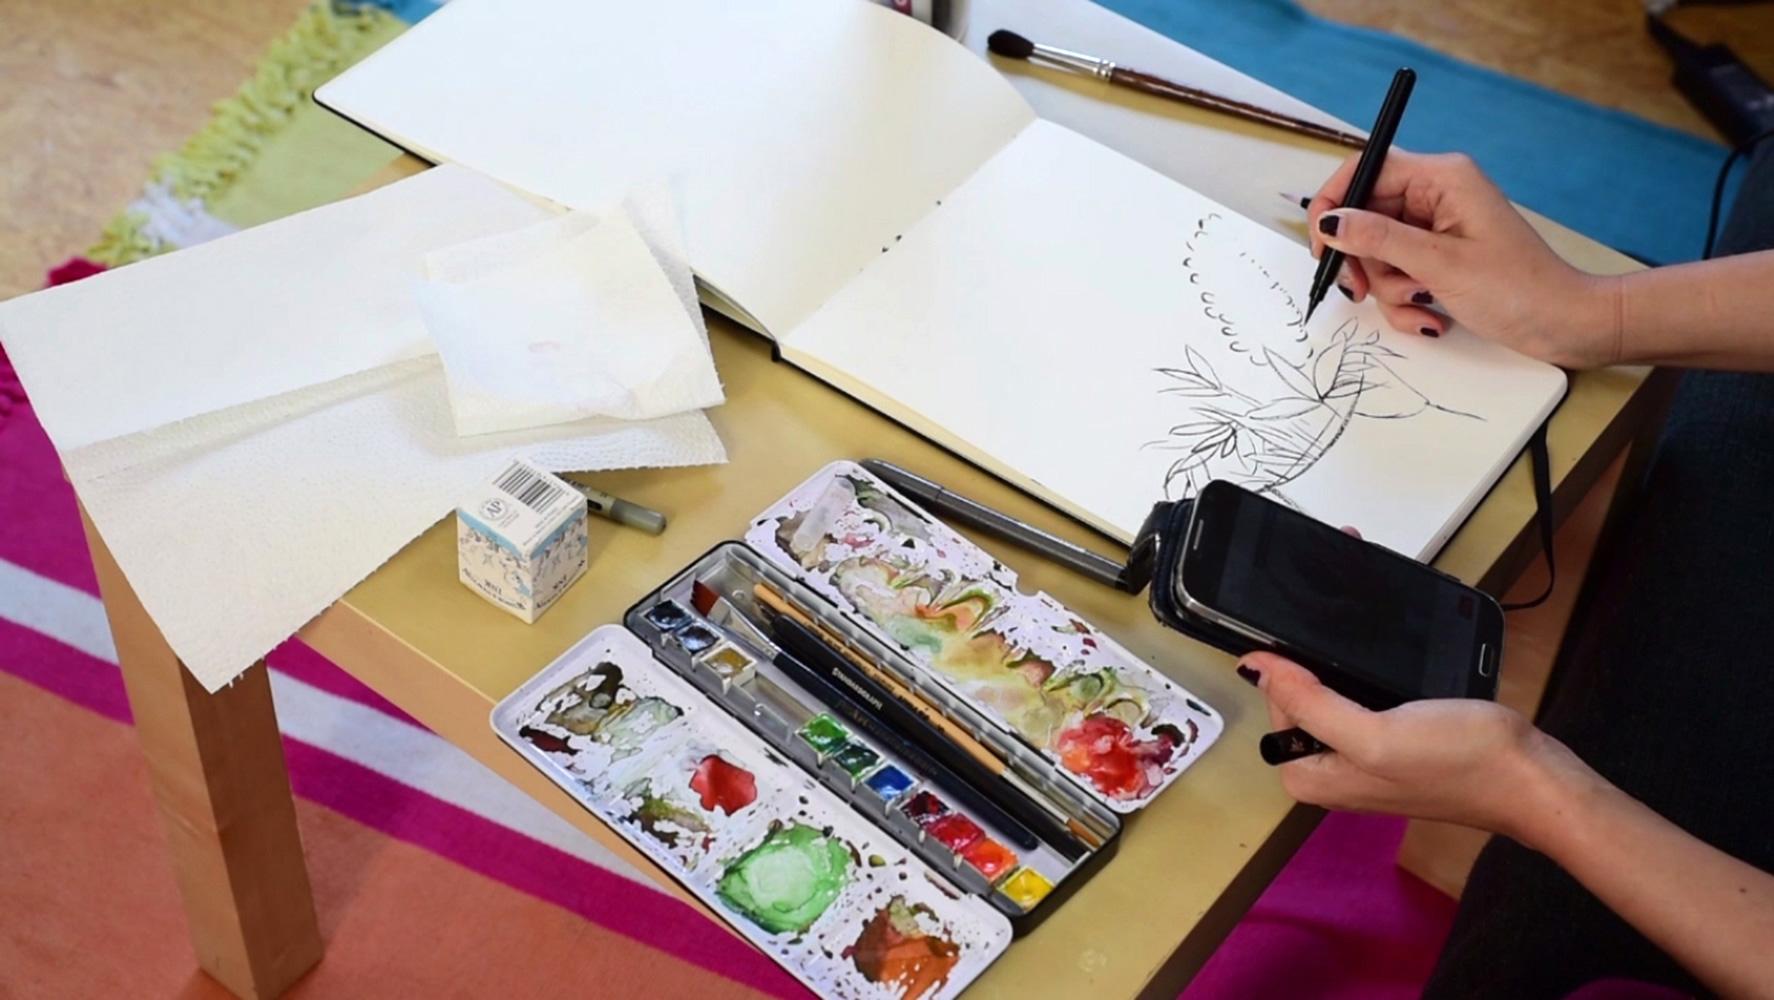 watercolor-lilacs-paintingprocess-stepbystep-franziskaschwade-1